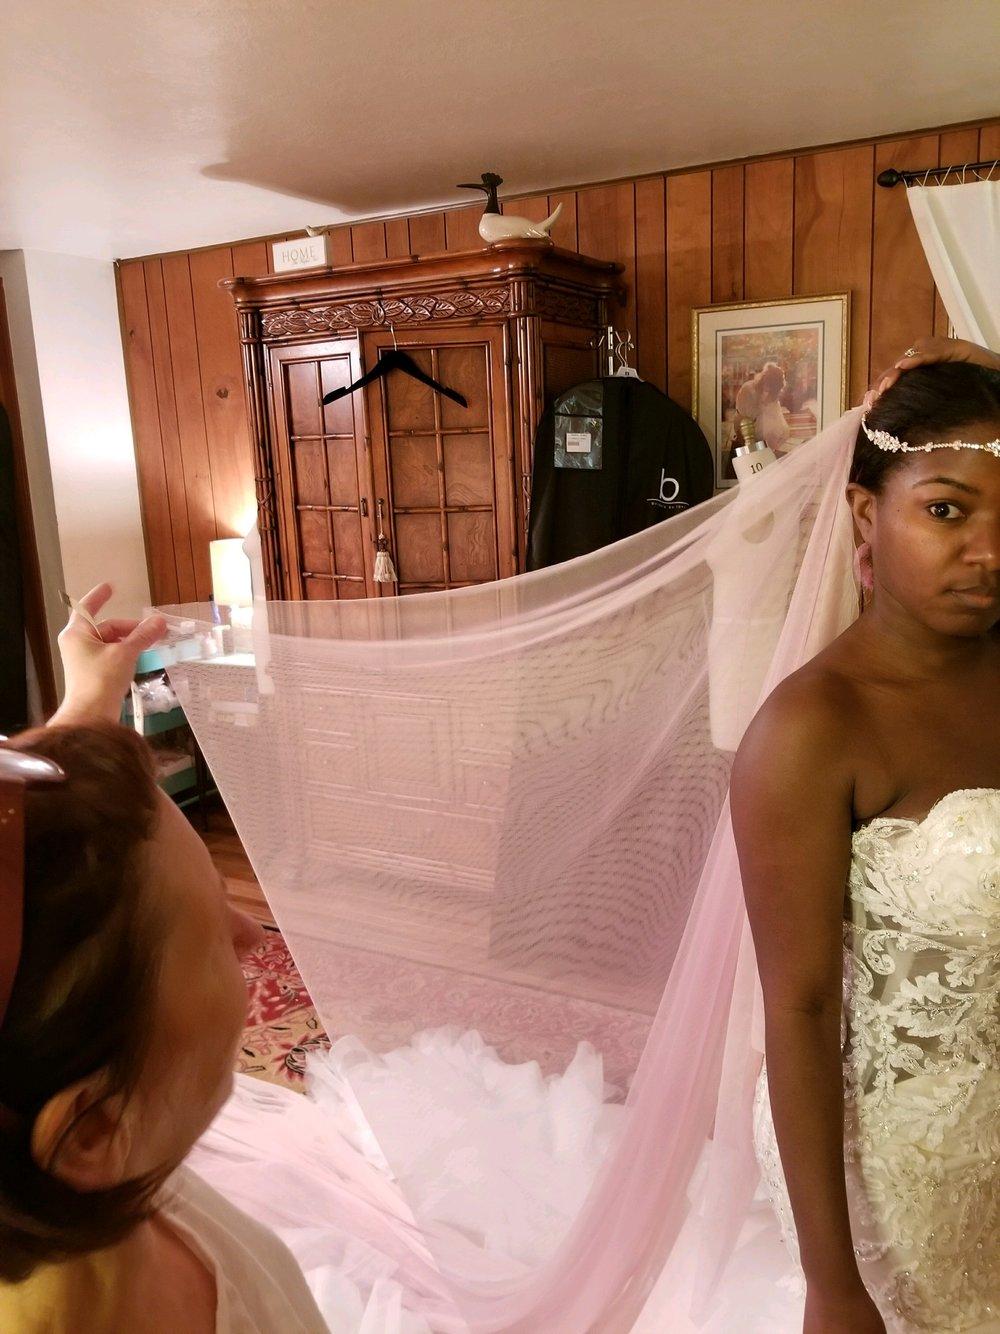 Black Destination Bride - BlackDesti Wedding Journal - Bridefriends Podcast -14 Headpiece 2 veils fabric drews fitting3.JPG